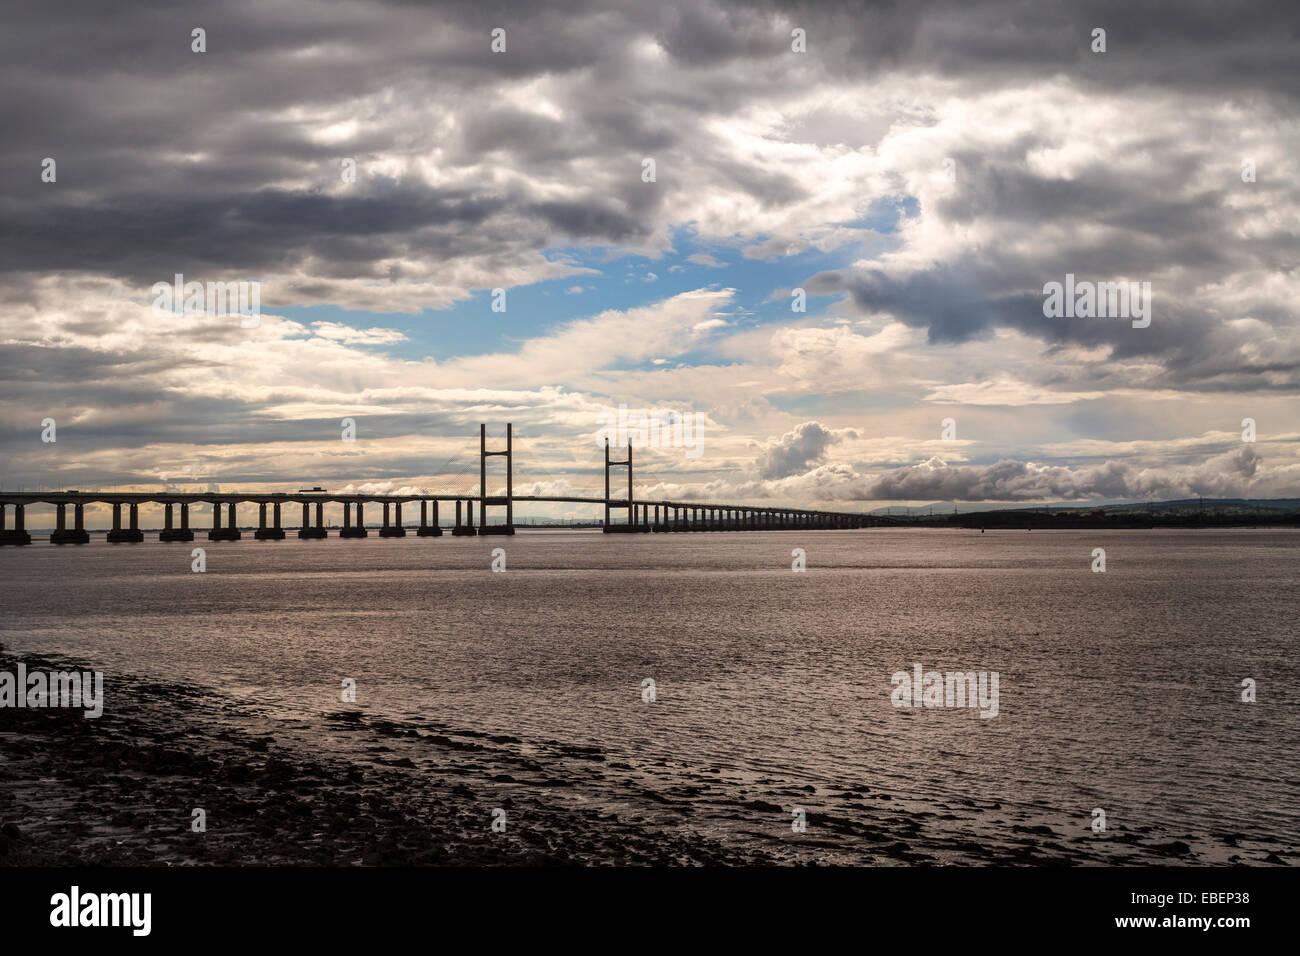 Severn Bridge, second crossing for River Severn, England, UK - Stock Image